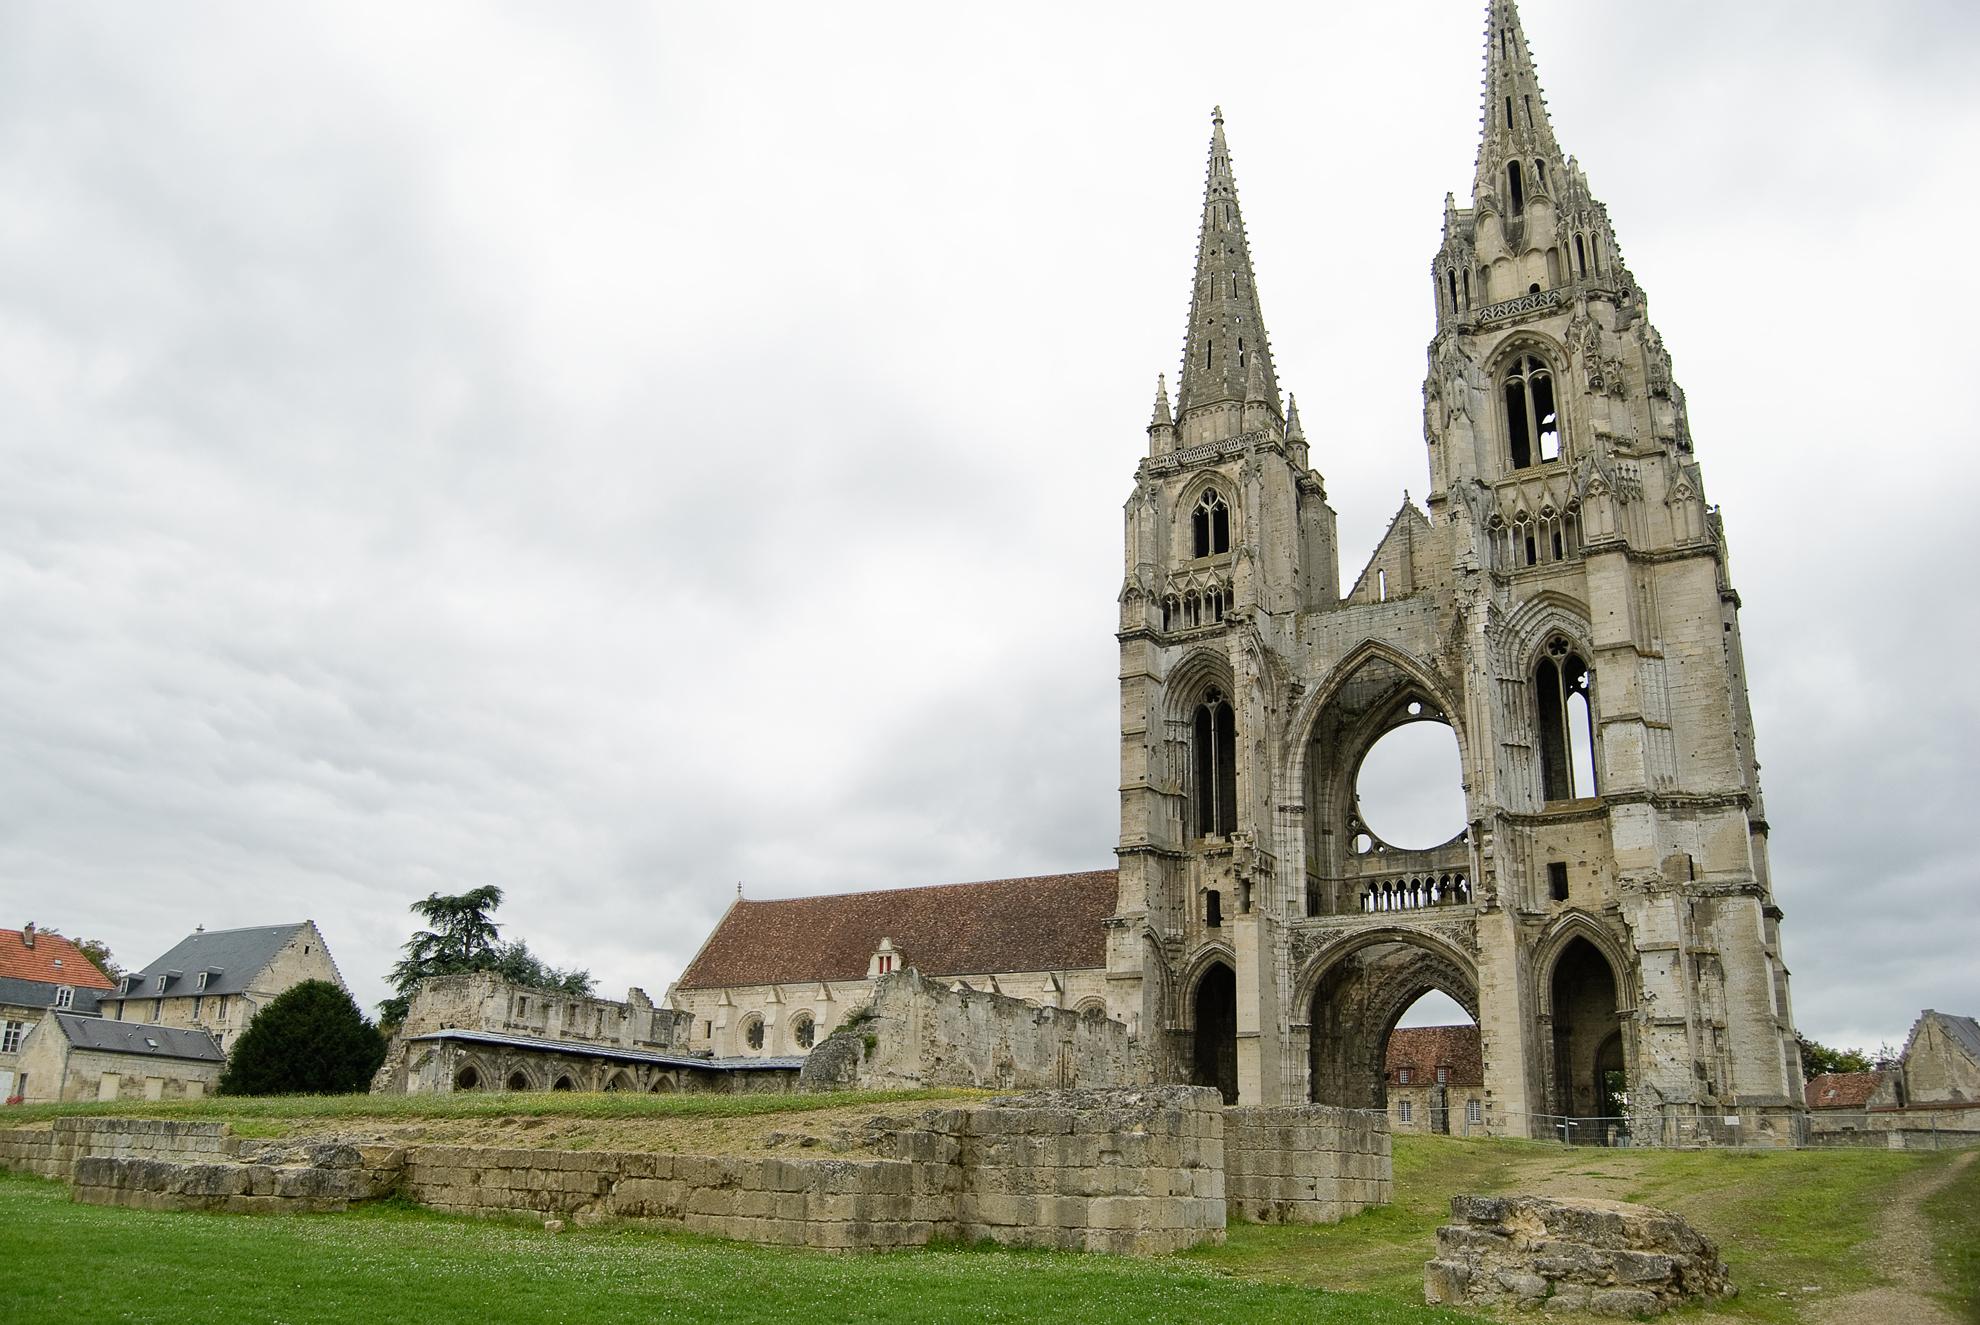 Ruiny opactwa Saint-Jean-des-Vignes